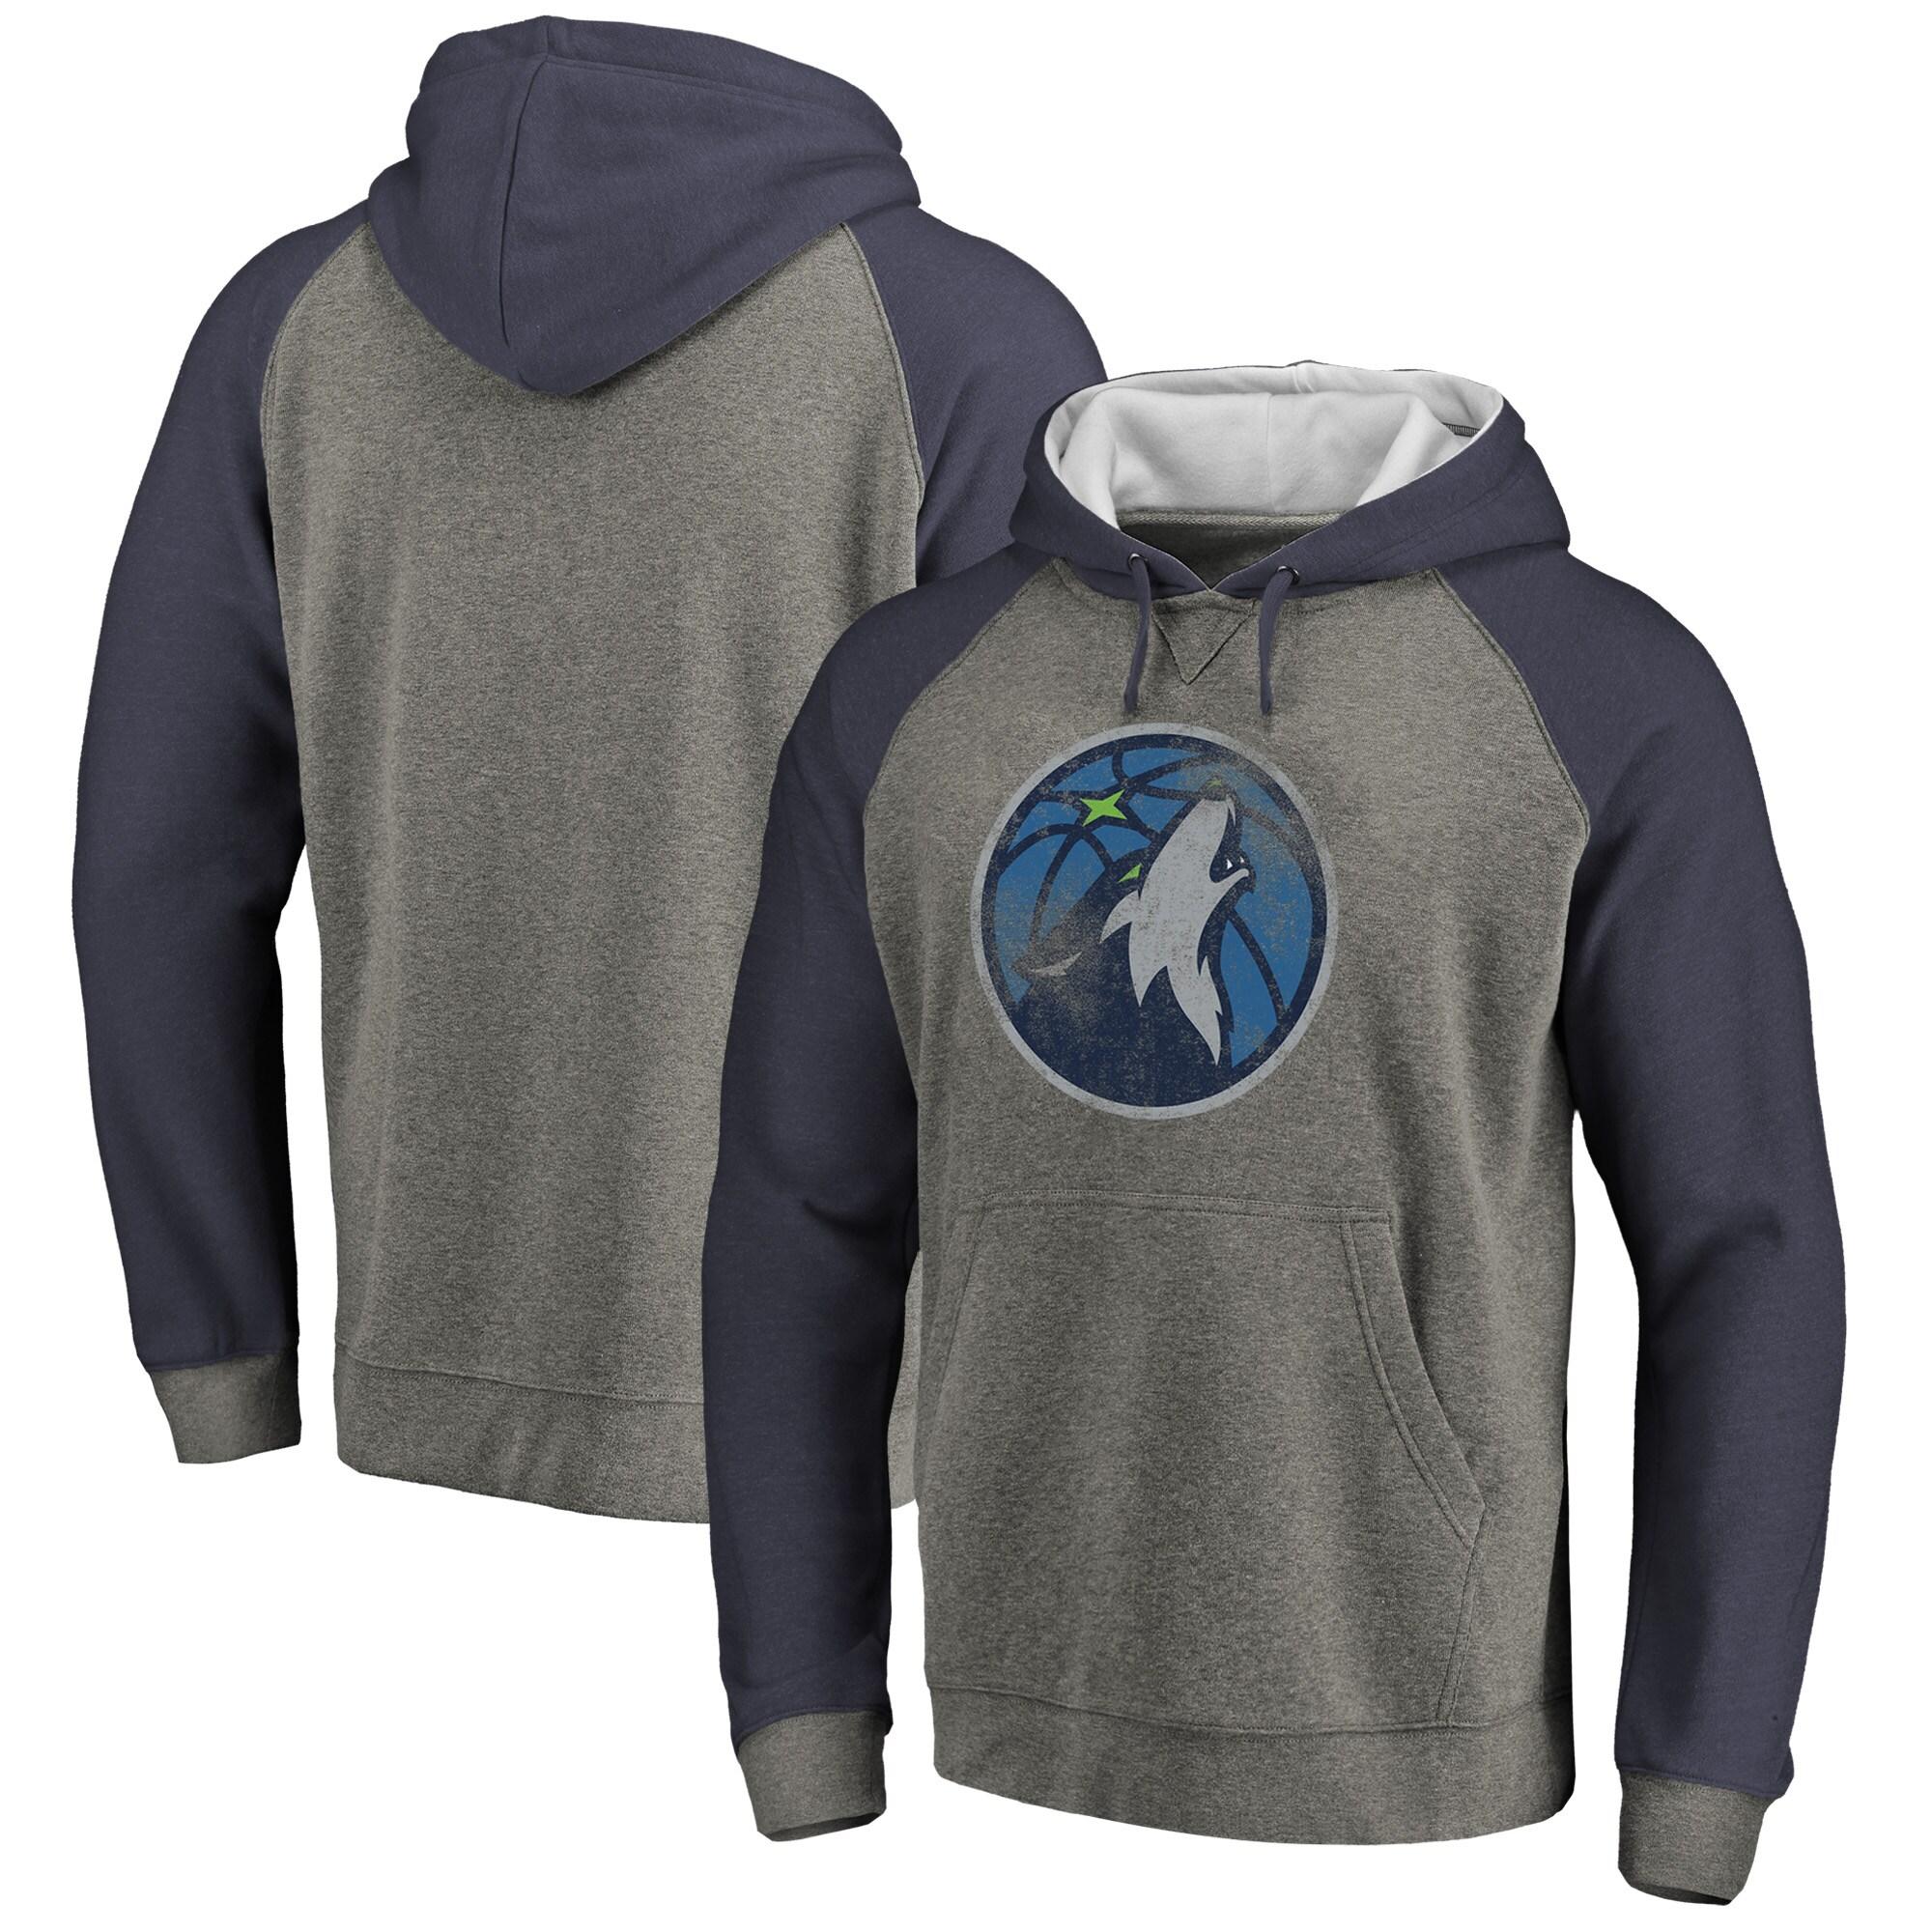 Minnesota Timberwolves Fanatics Branded Distressed Logo Tri-Blend Pullover Hoodie - Ash/Navy